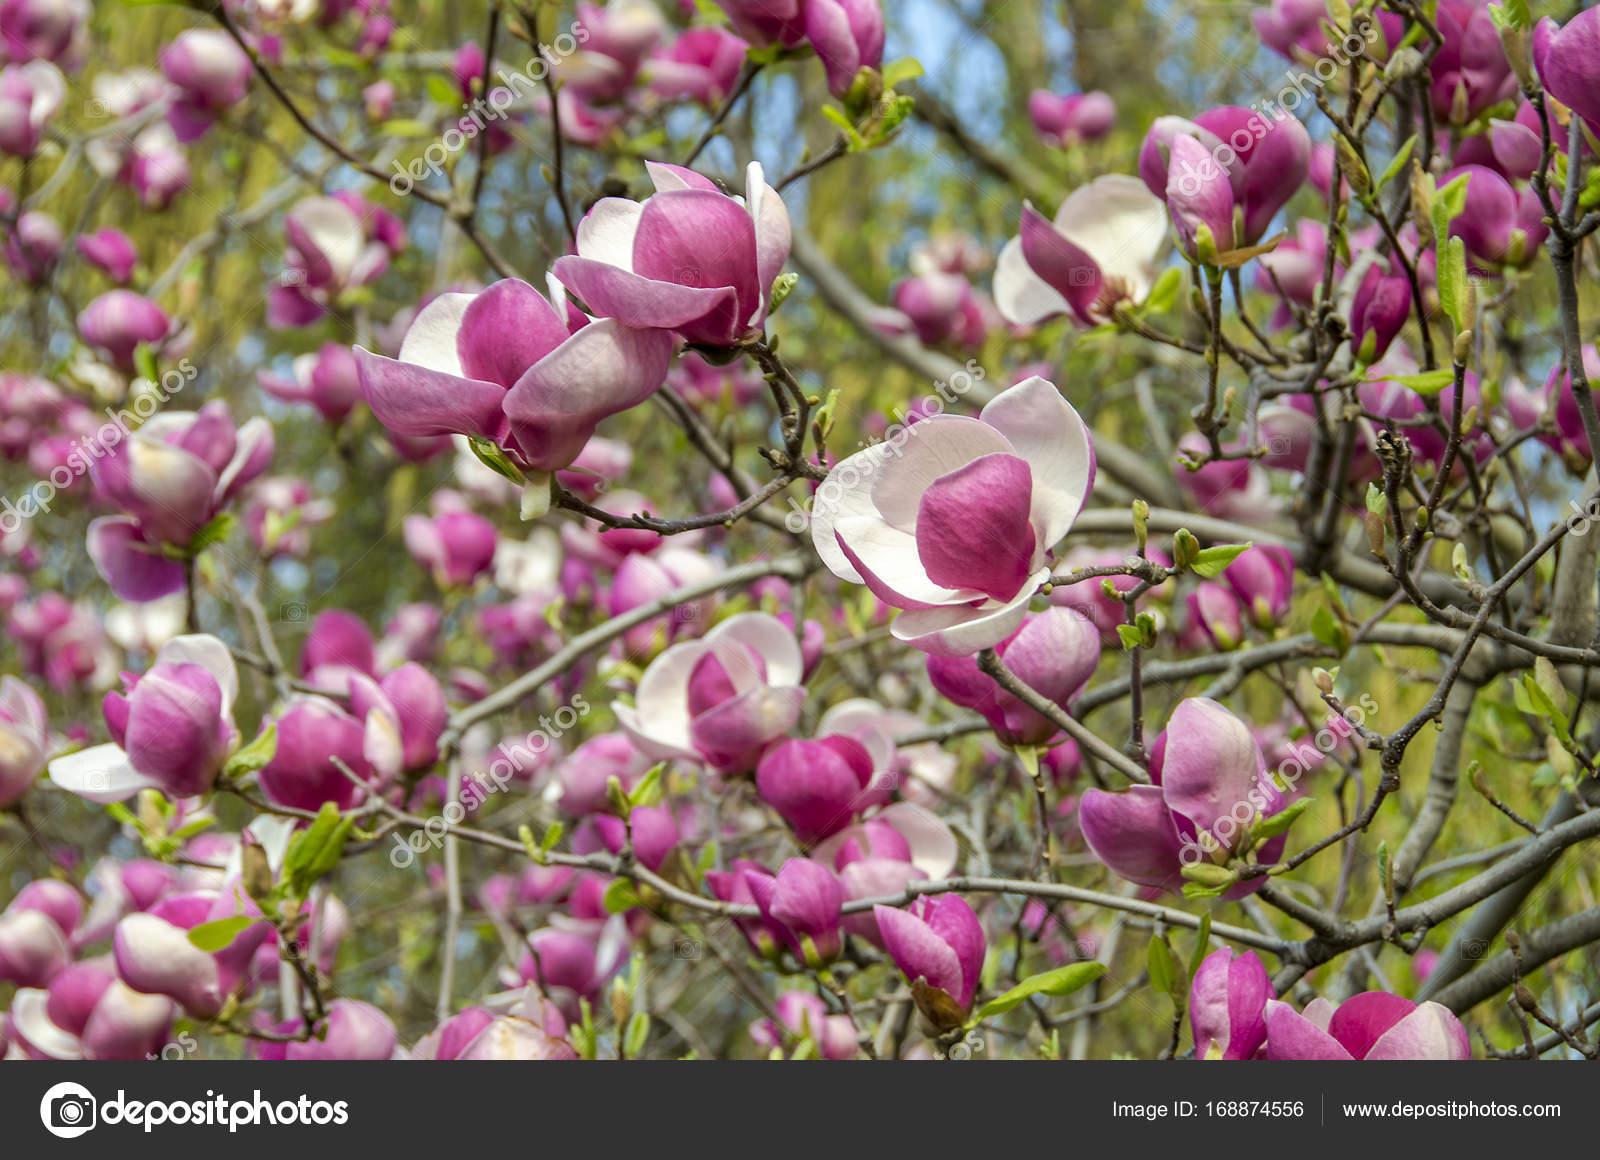 Magnolia Tree Bloom Flowers Stock Photo Jovep305gmail